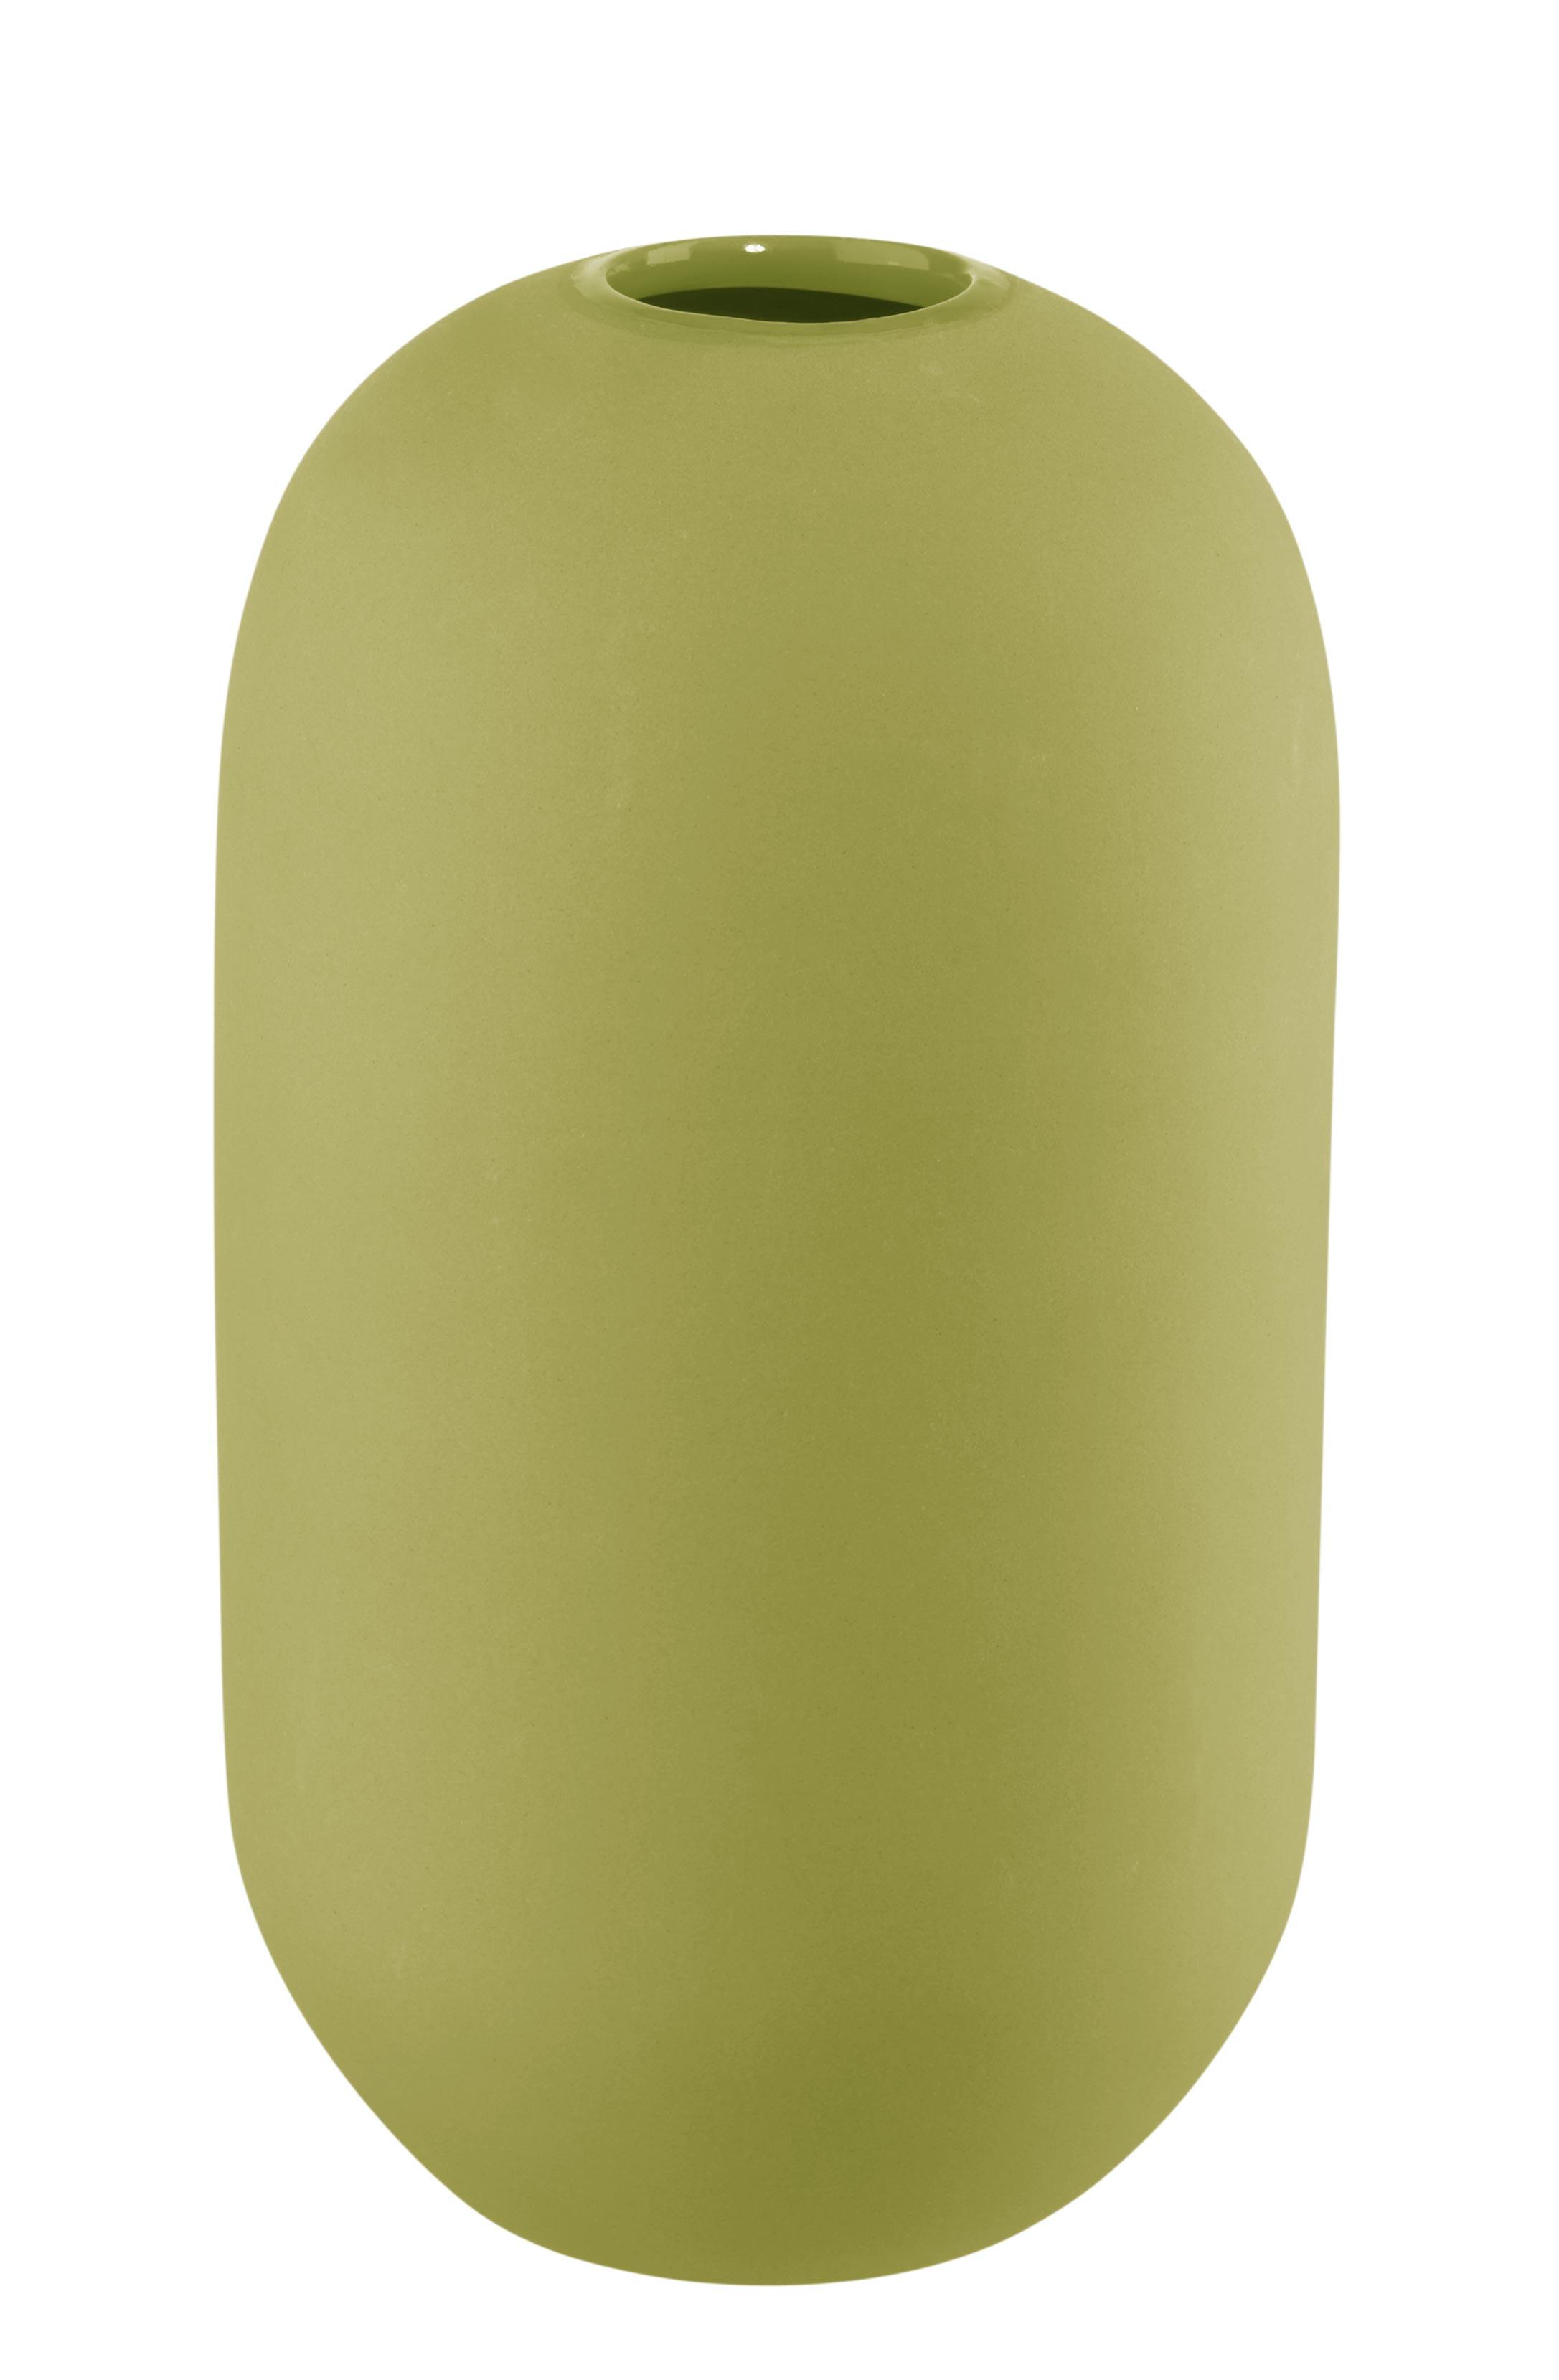 vase olive vasen bert pfe produkte home by asa die asa selection wohnwelten. Black Bedroom Furniture Sets. Home Design Ideas